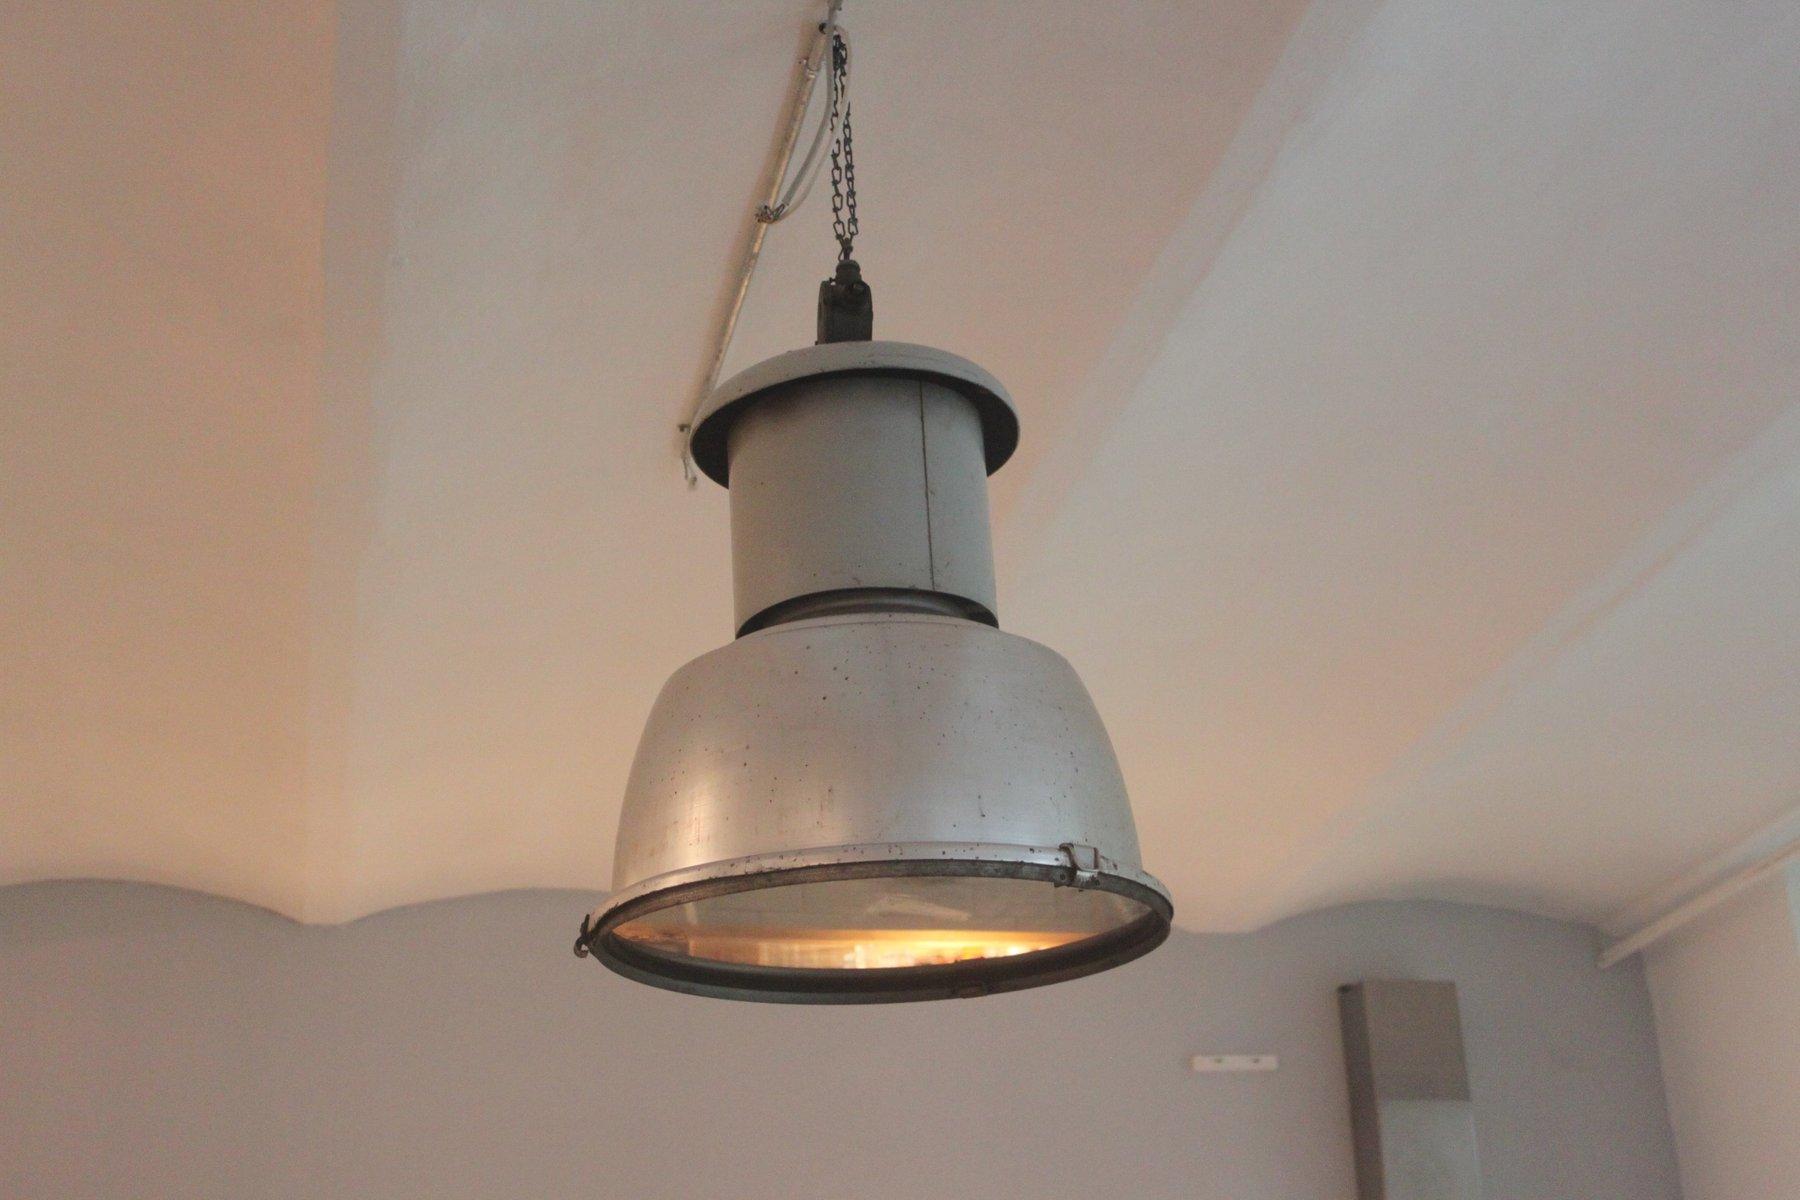 Gro e industrielle vintage lampe bei pamono kaufen - Lampe vintage industrielle ...